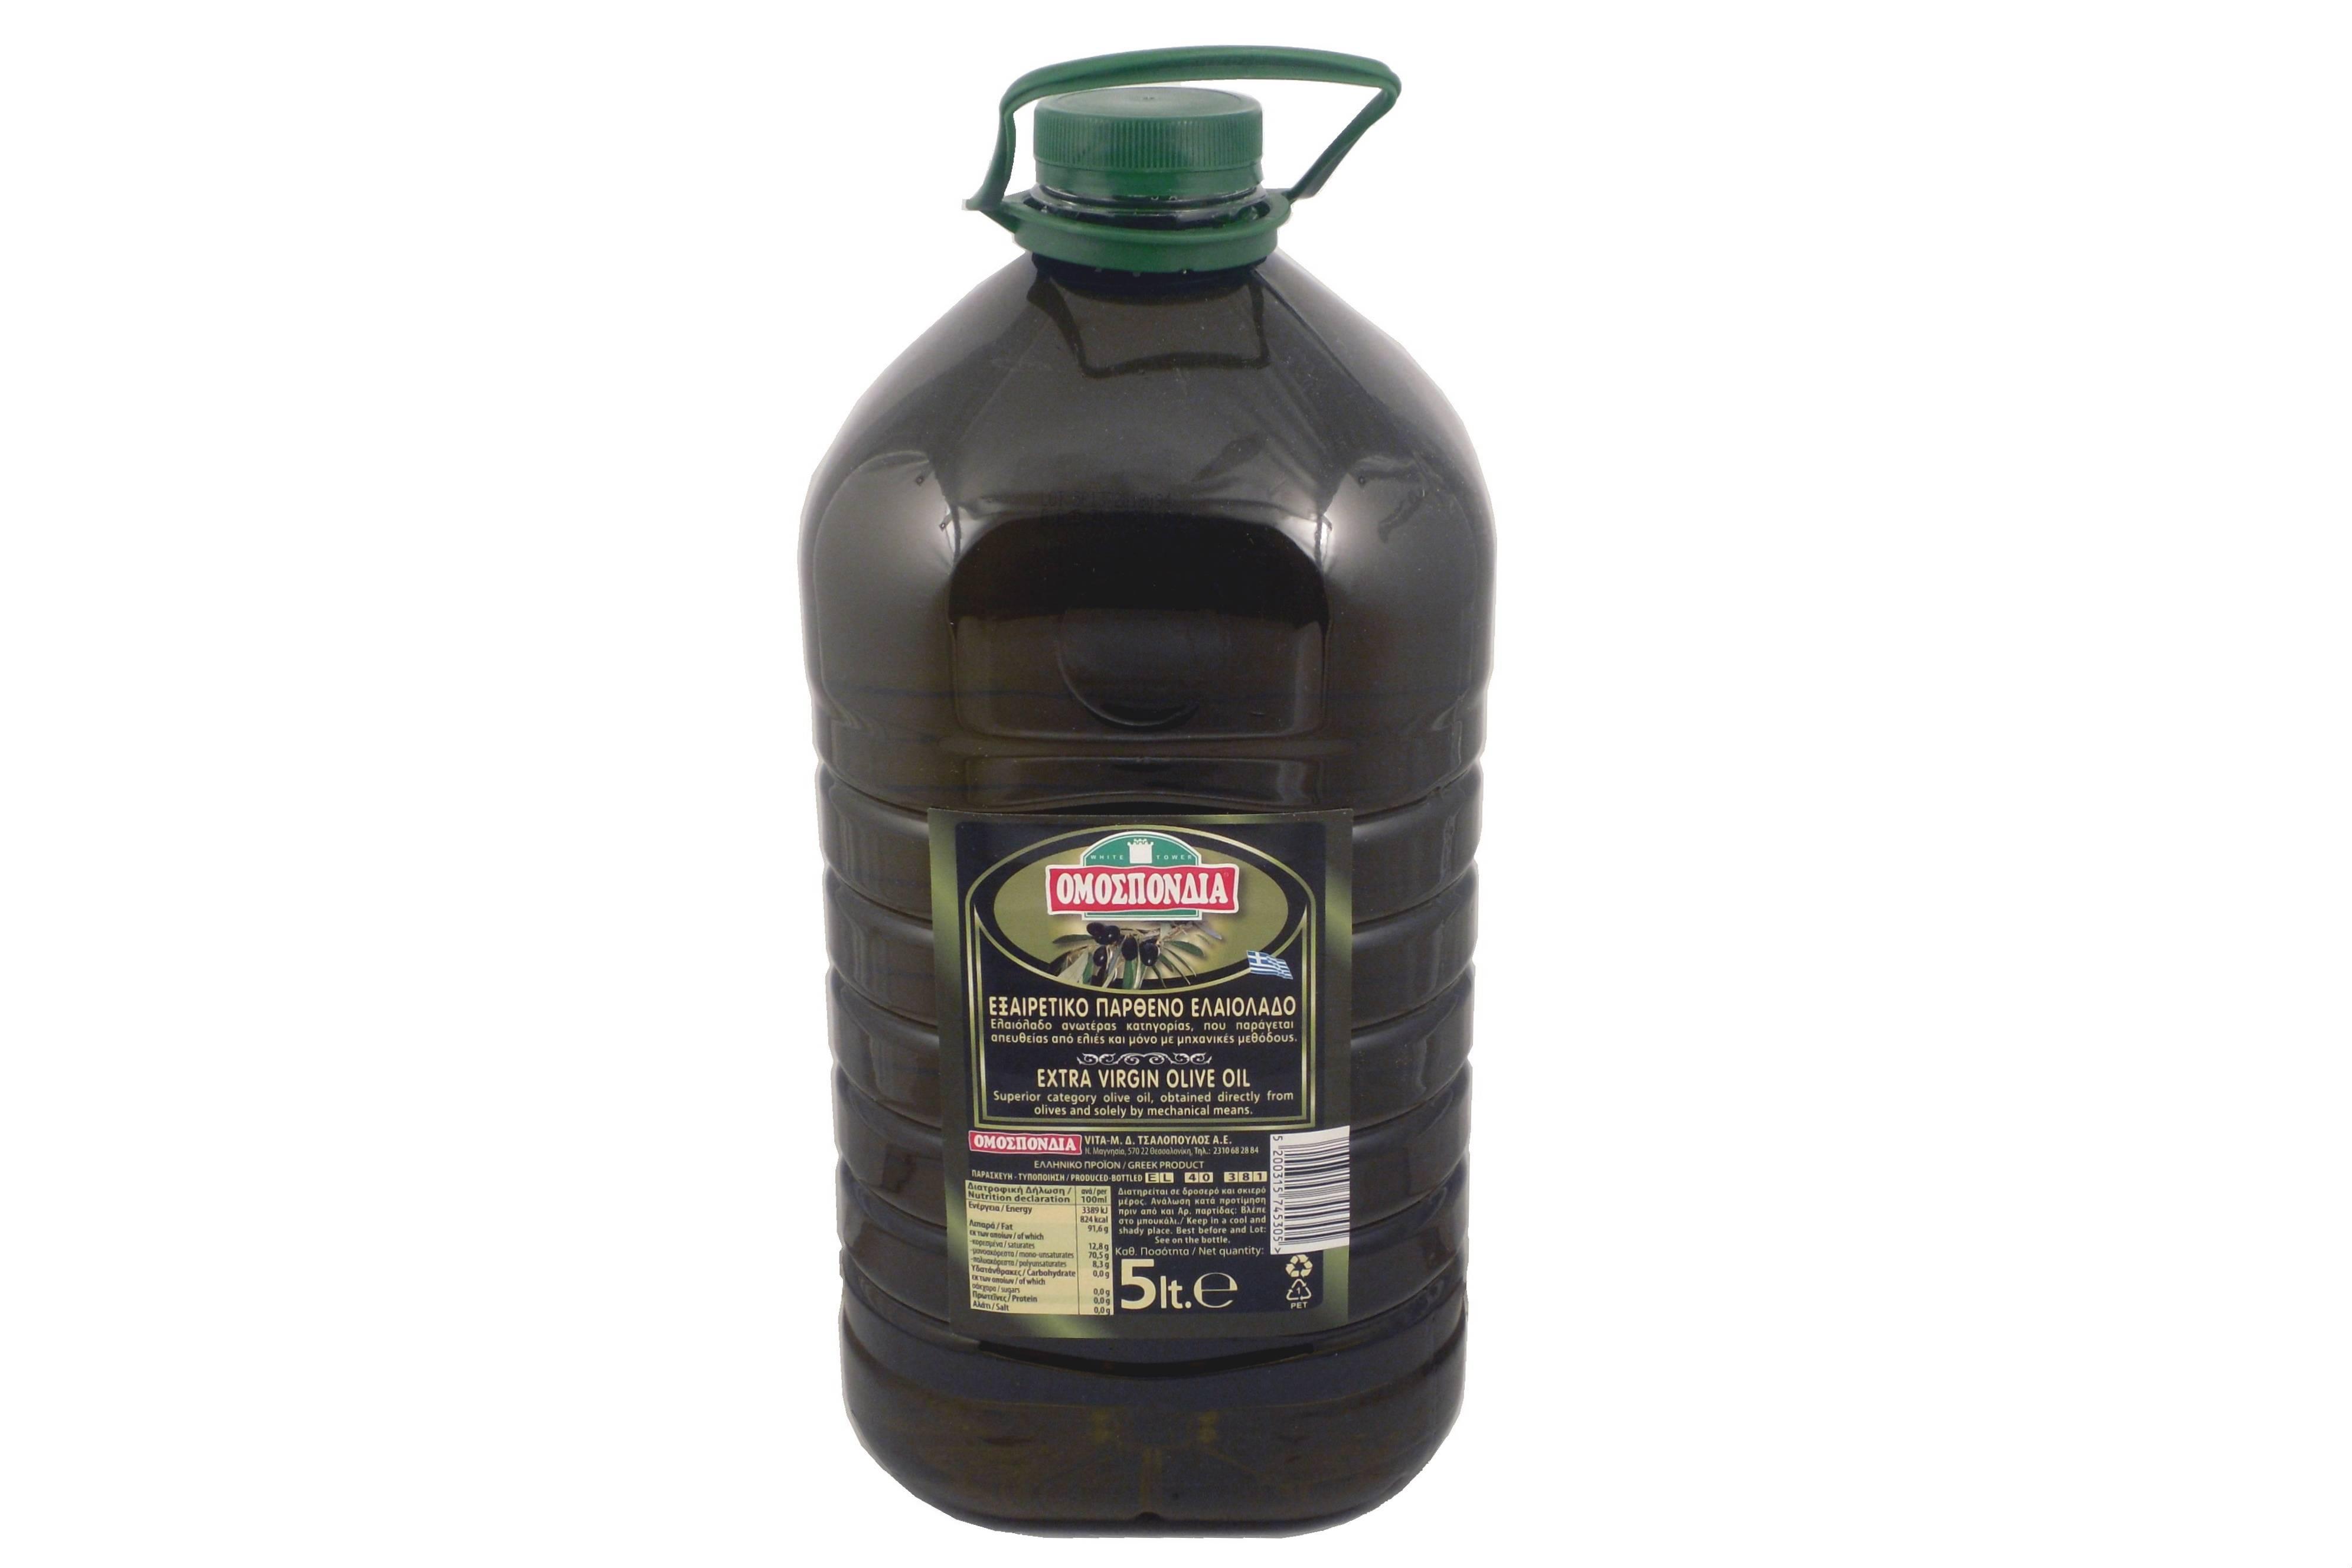 OMOSPONDIA EXTRA VIRGIN OLIVE OIL 5lt PET - Code 4367002